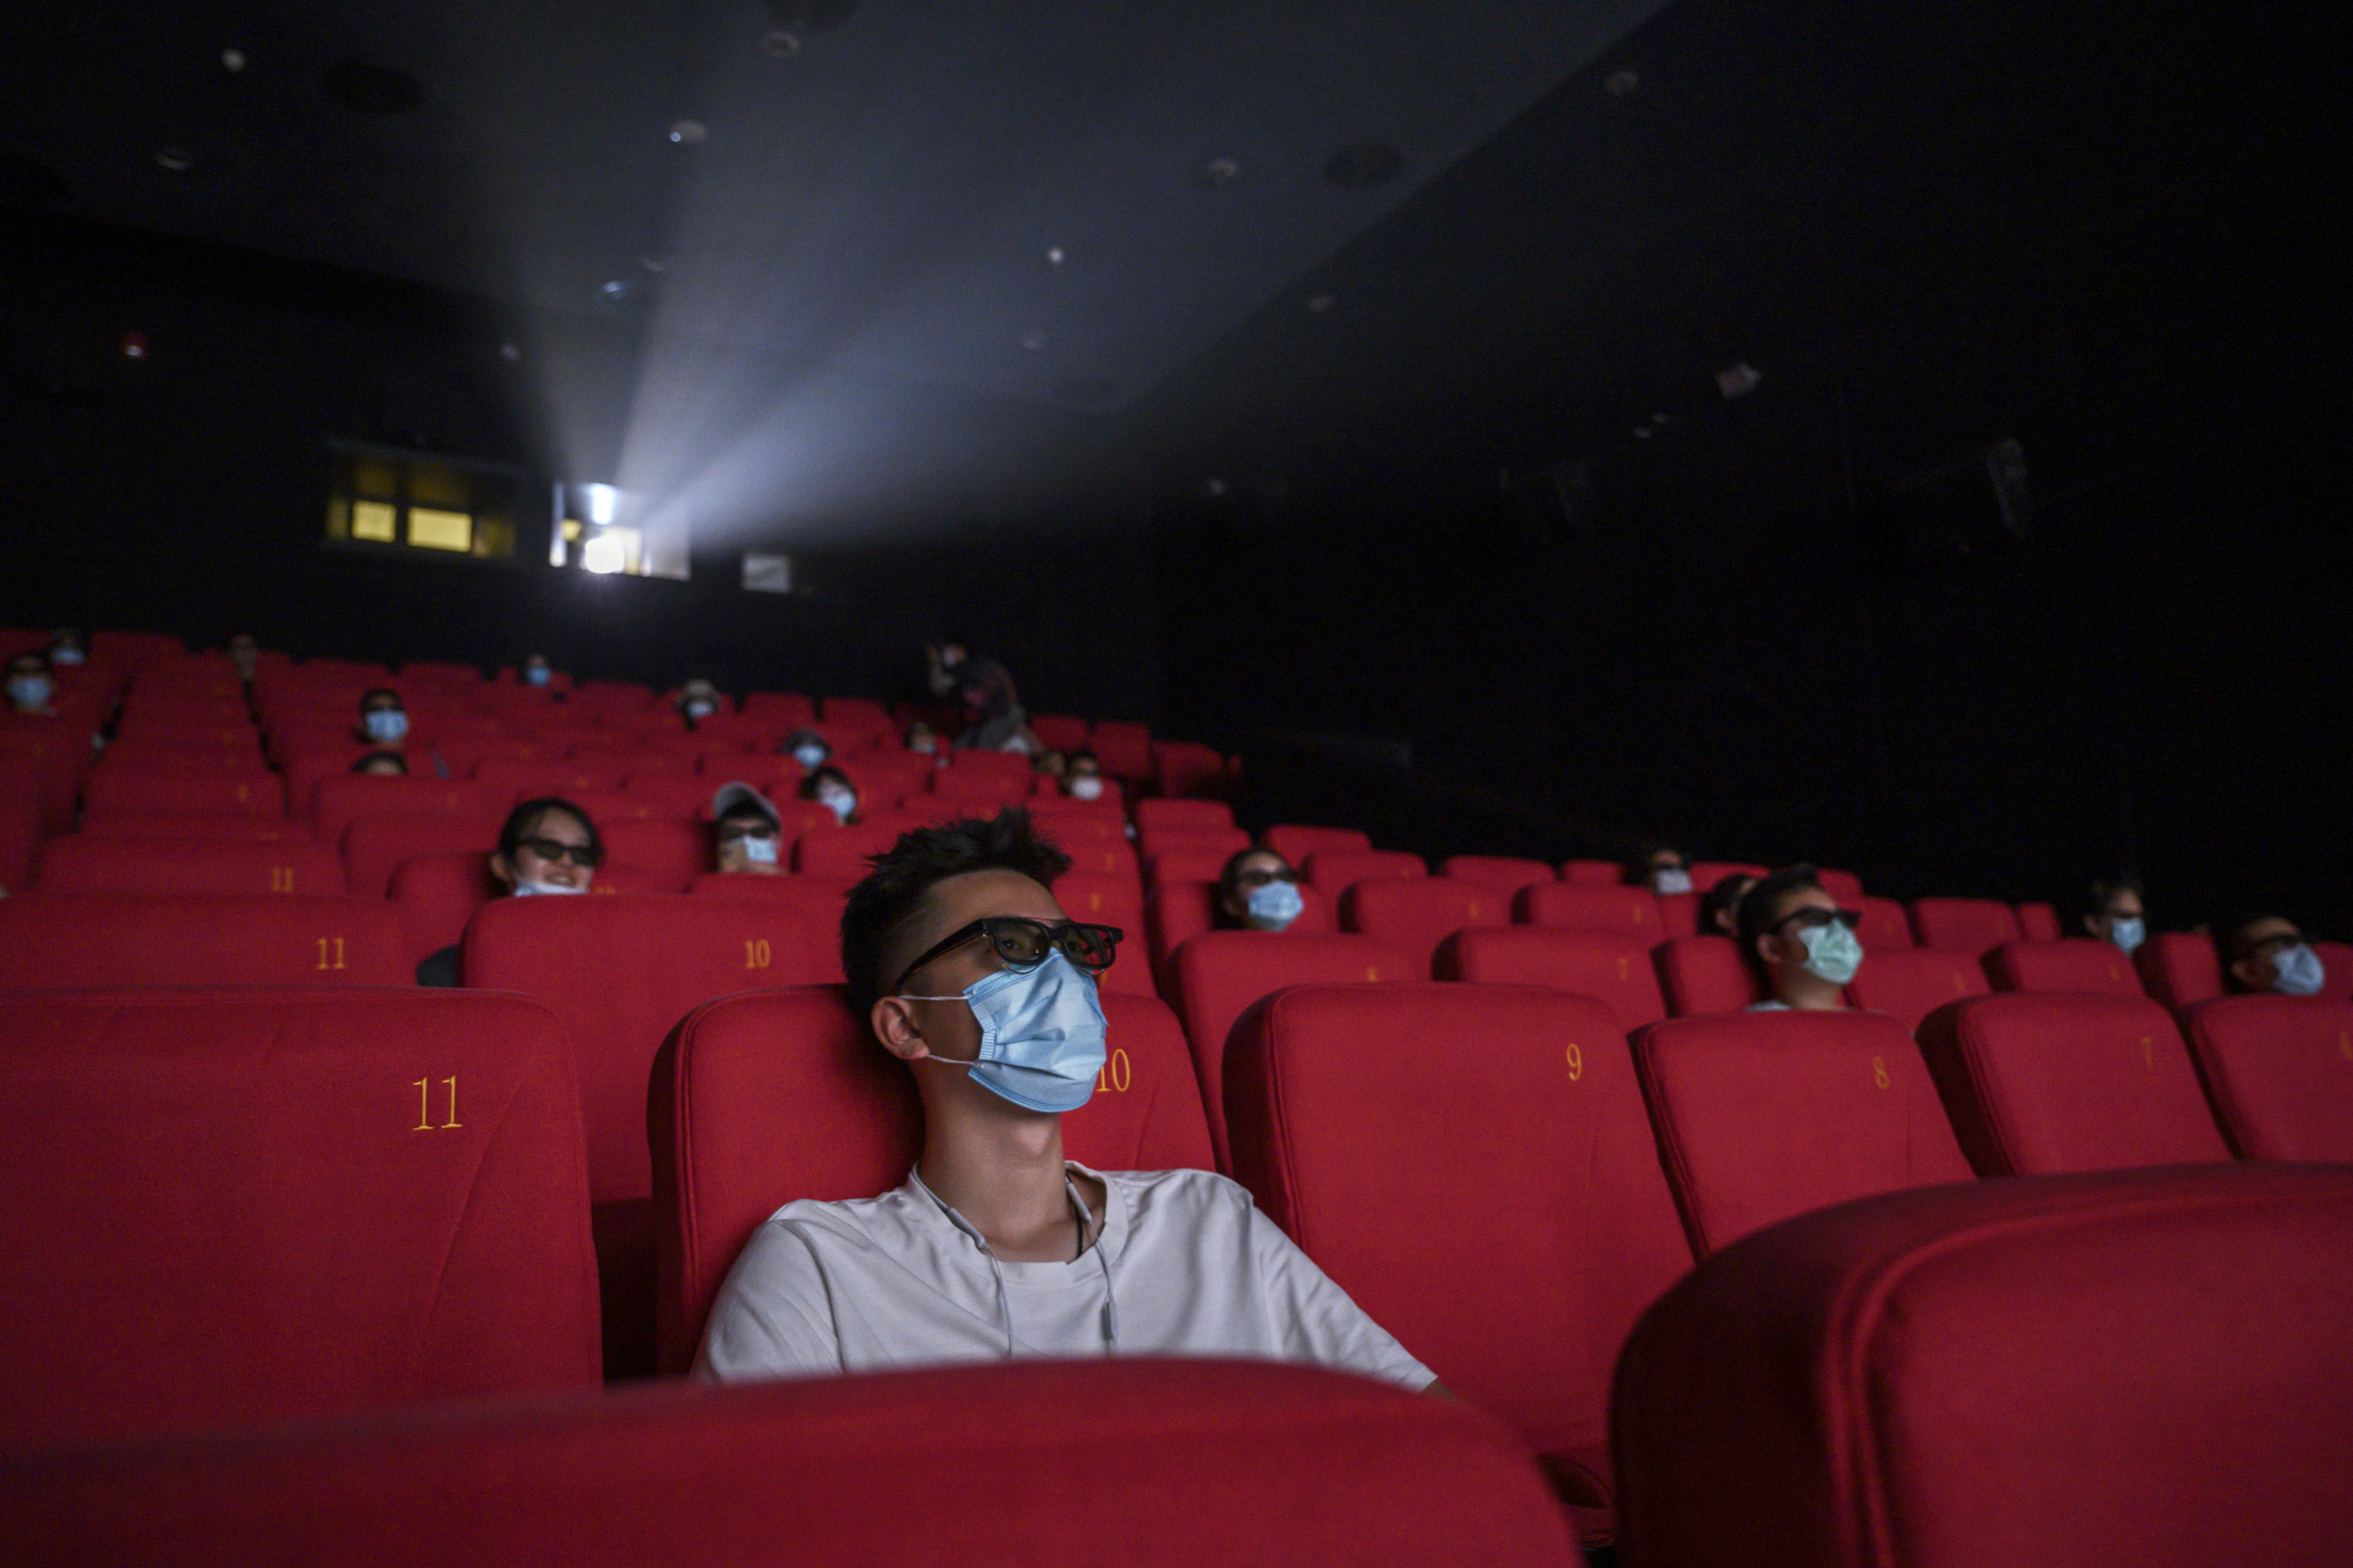 China slams high actor pay, bars 'effeminate' behavior from screens